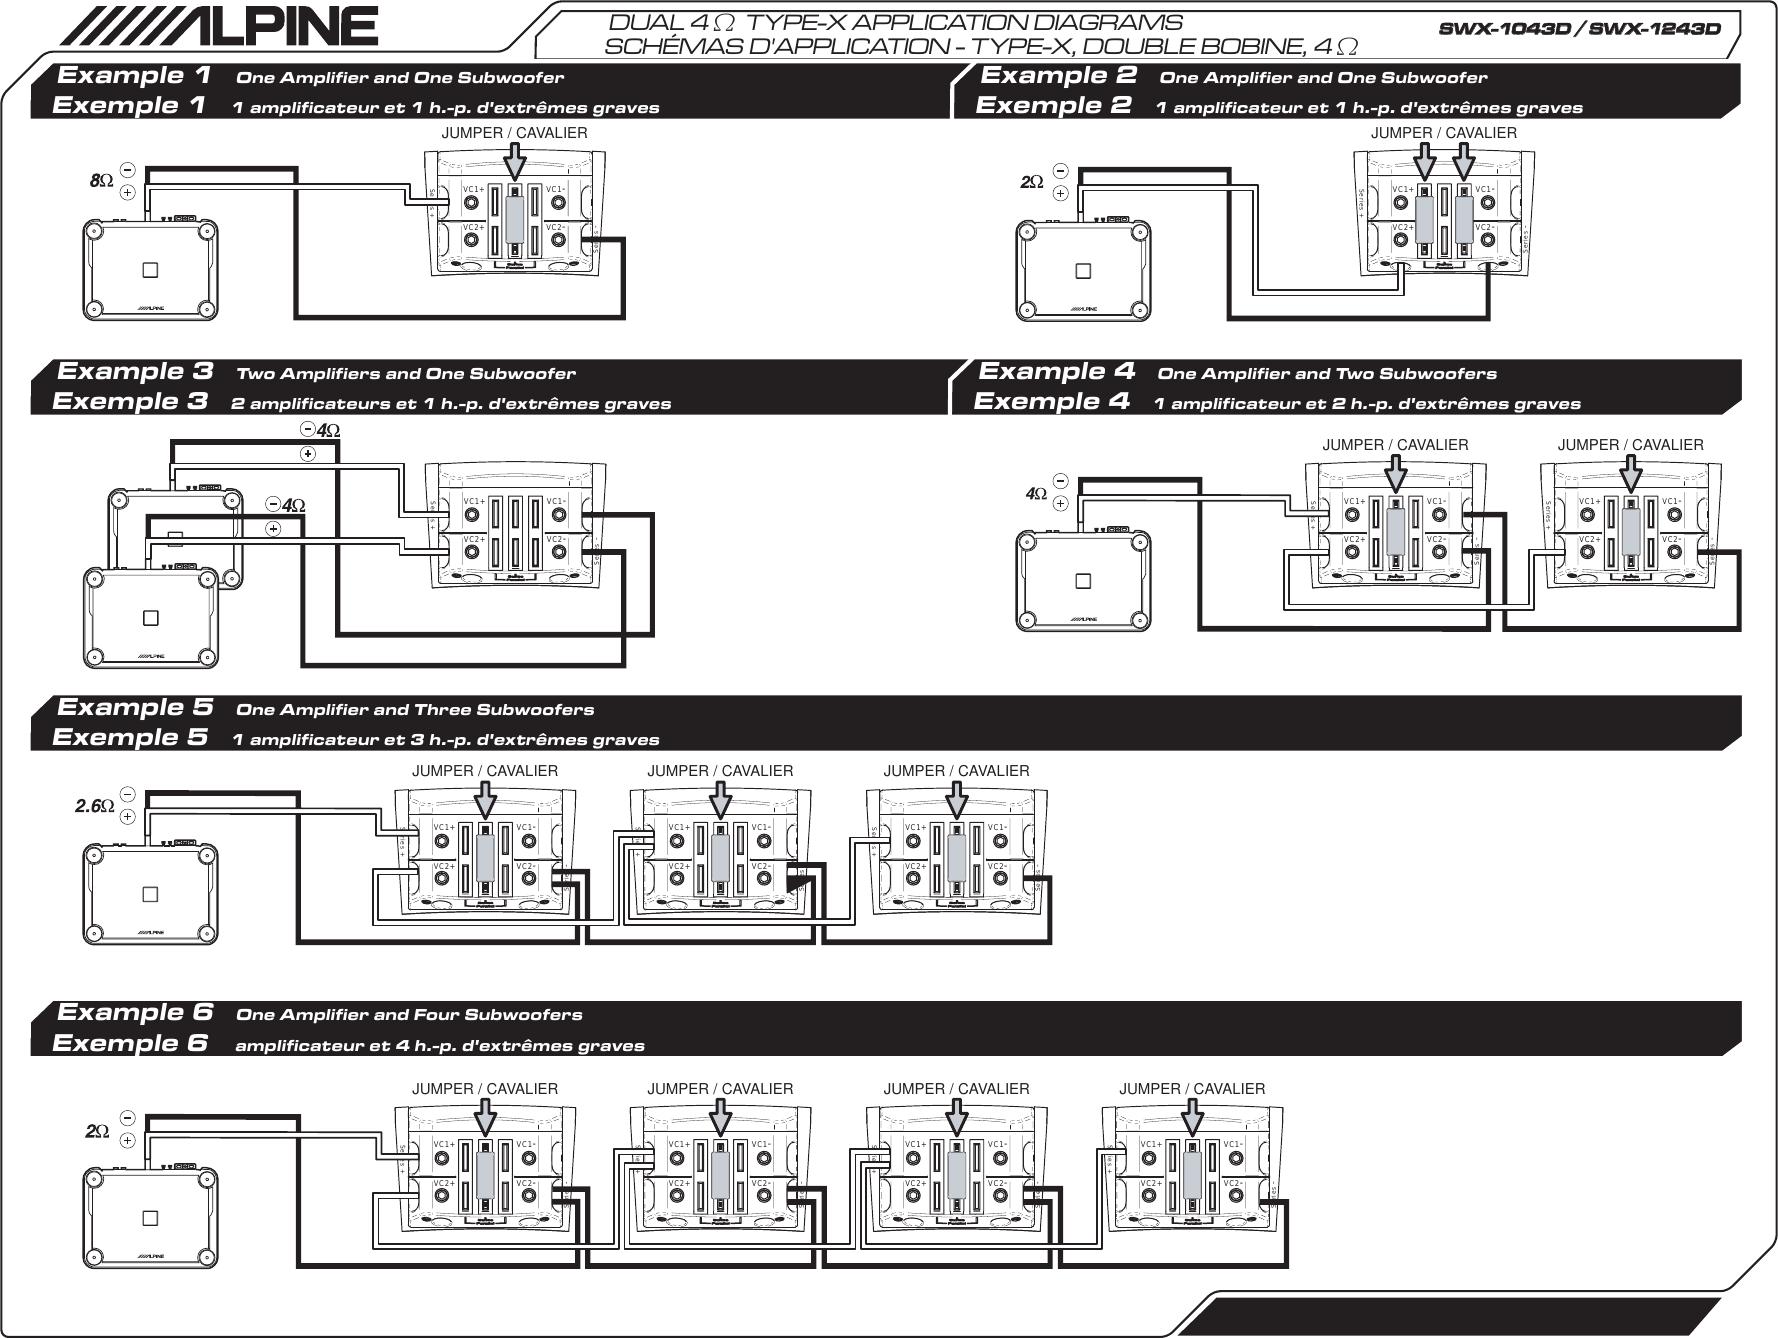 Alpine Type X Swx 1043d Users Manual Tx 07 03 08分頁